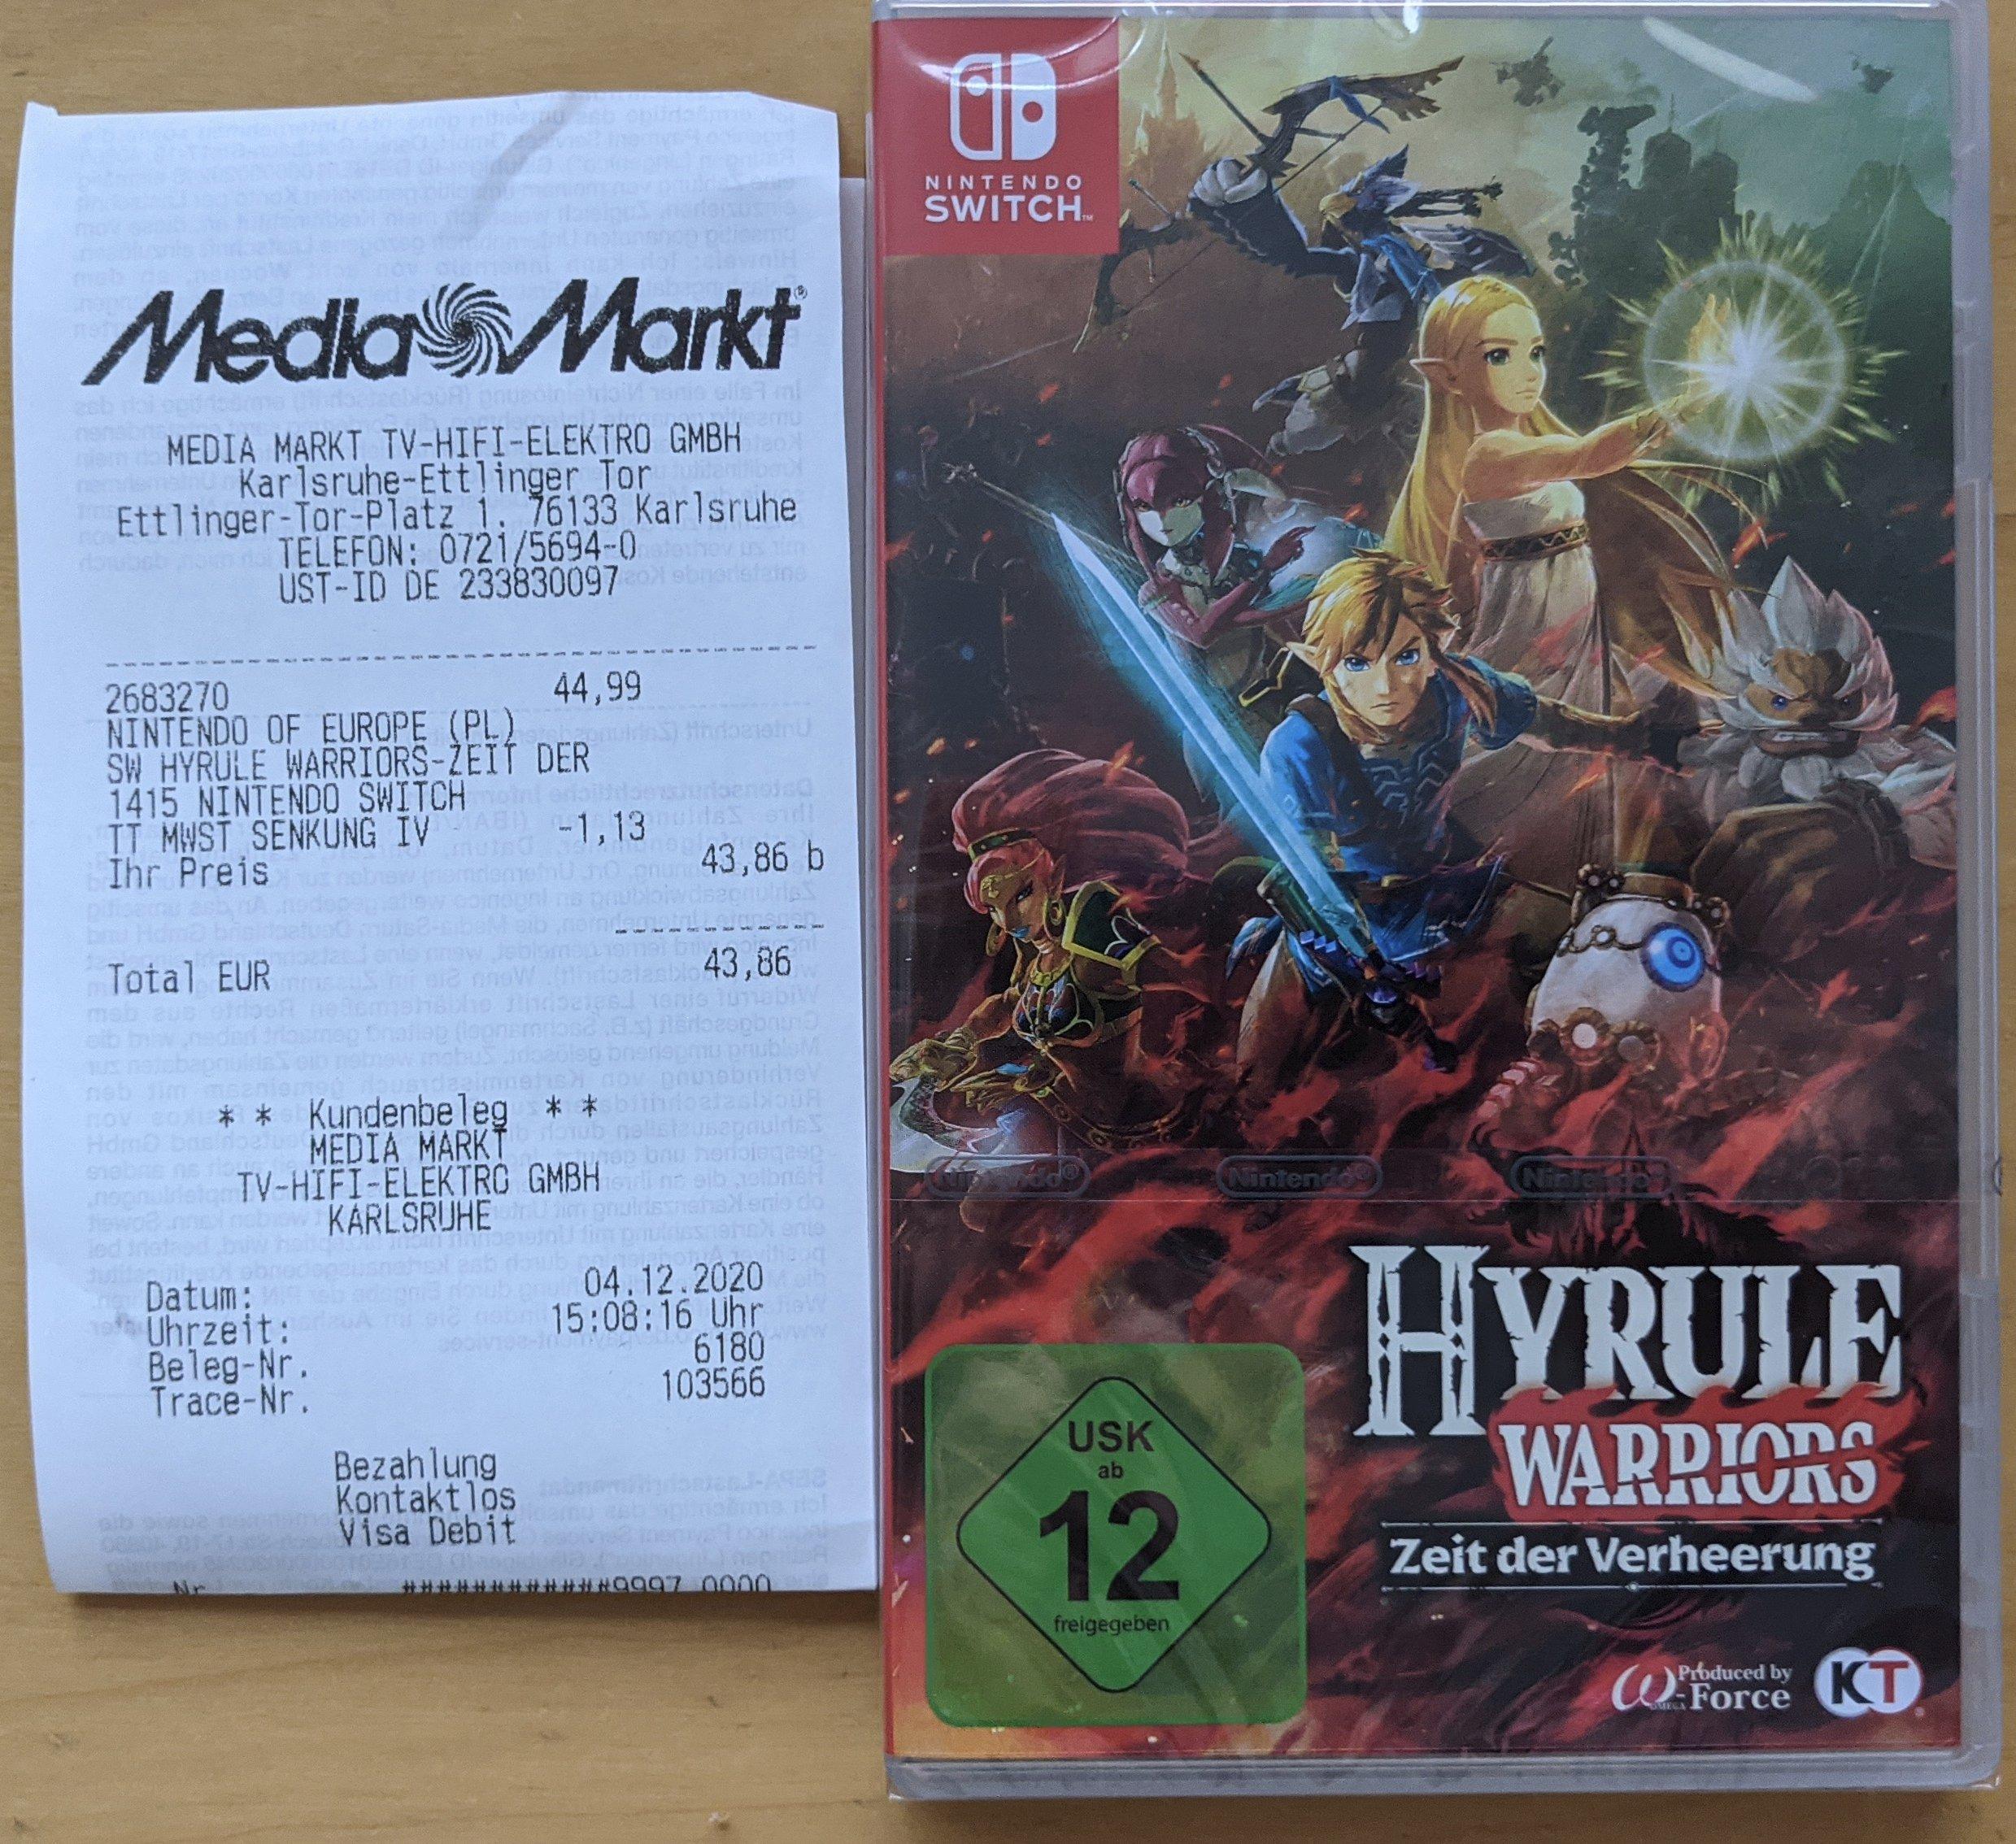 [lokal] Hyrule Warriors - Zeit der Verheerung @ Media Markt Karlsruhe Ettlinger Tor Center